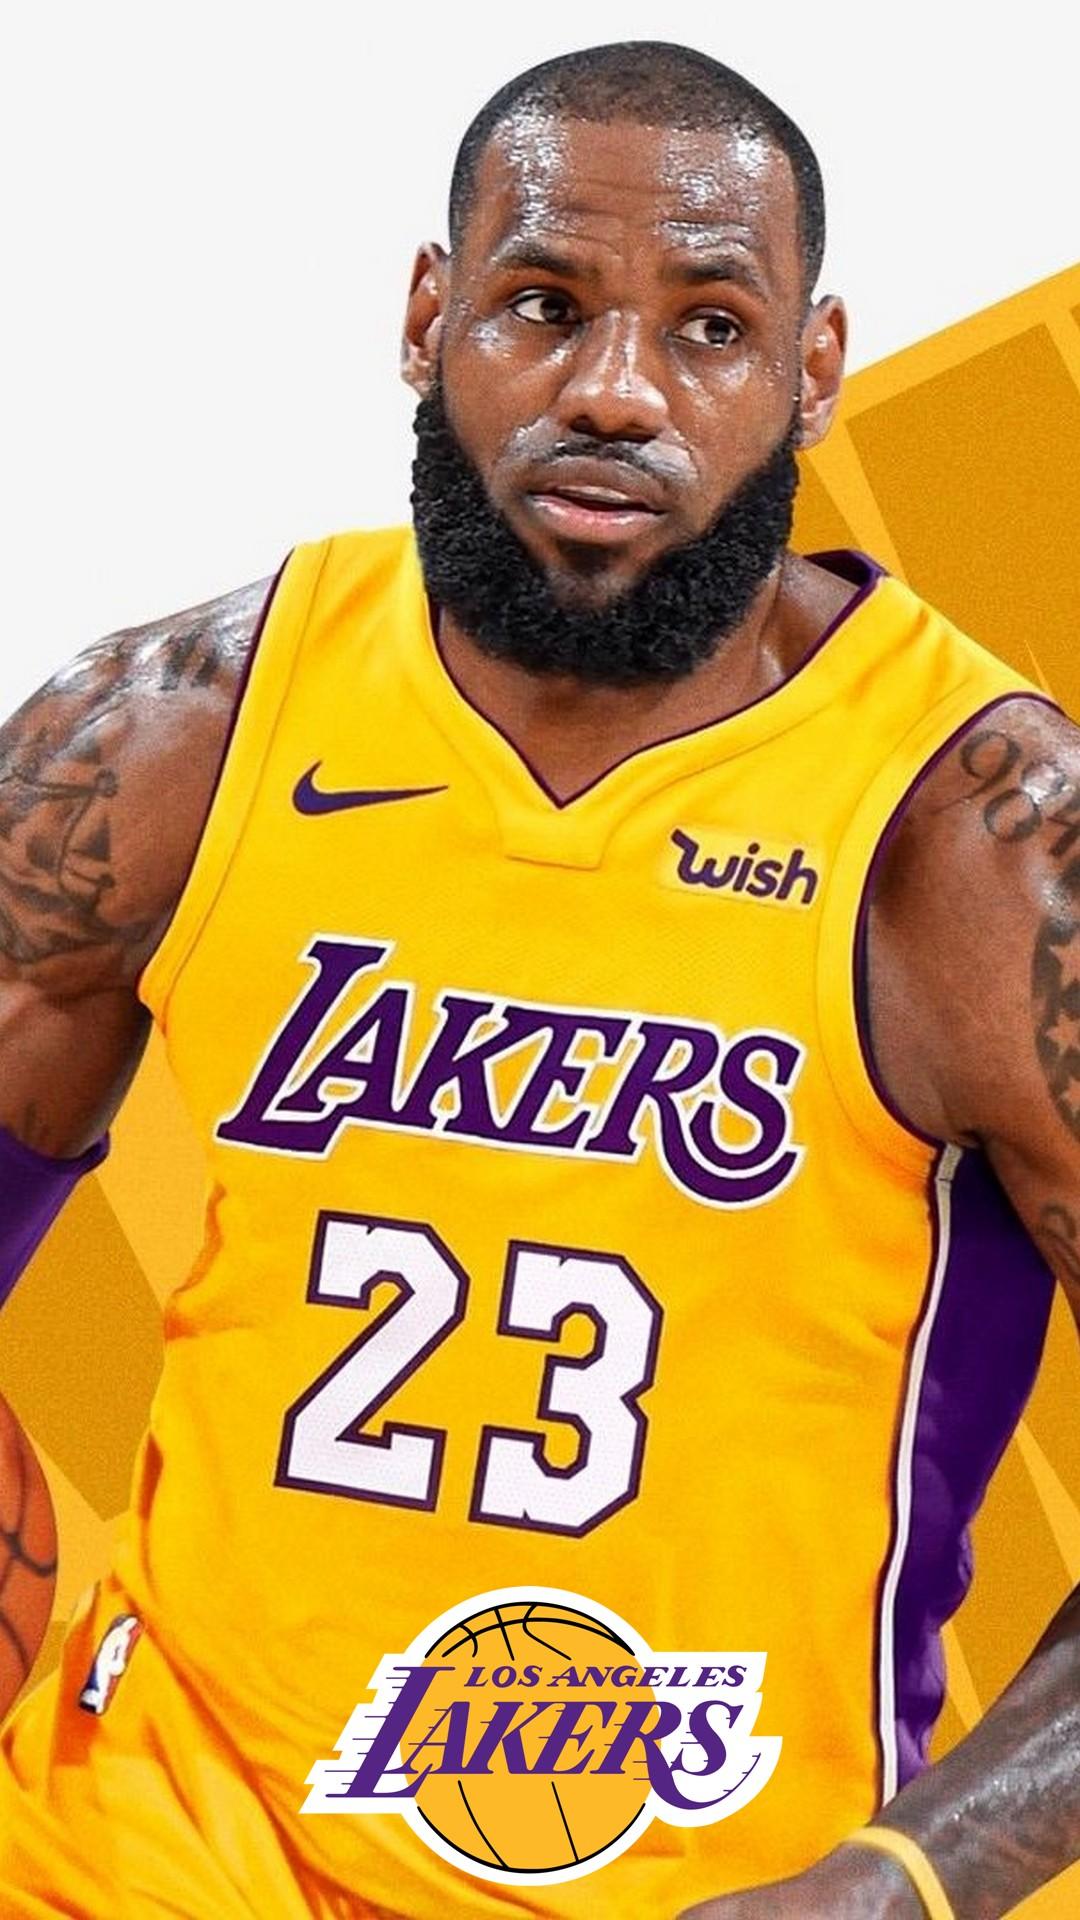 iPhone Wallpaper HD LeBron James Lakers 2020 Basketball Wallpaper 1080x1920